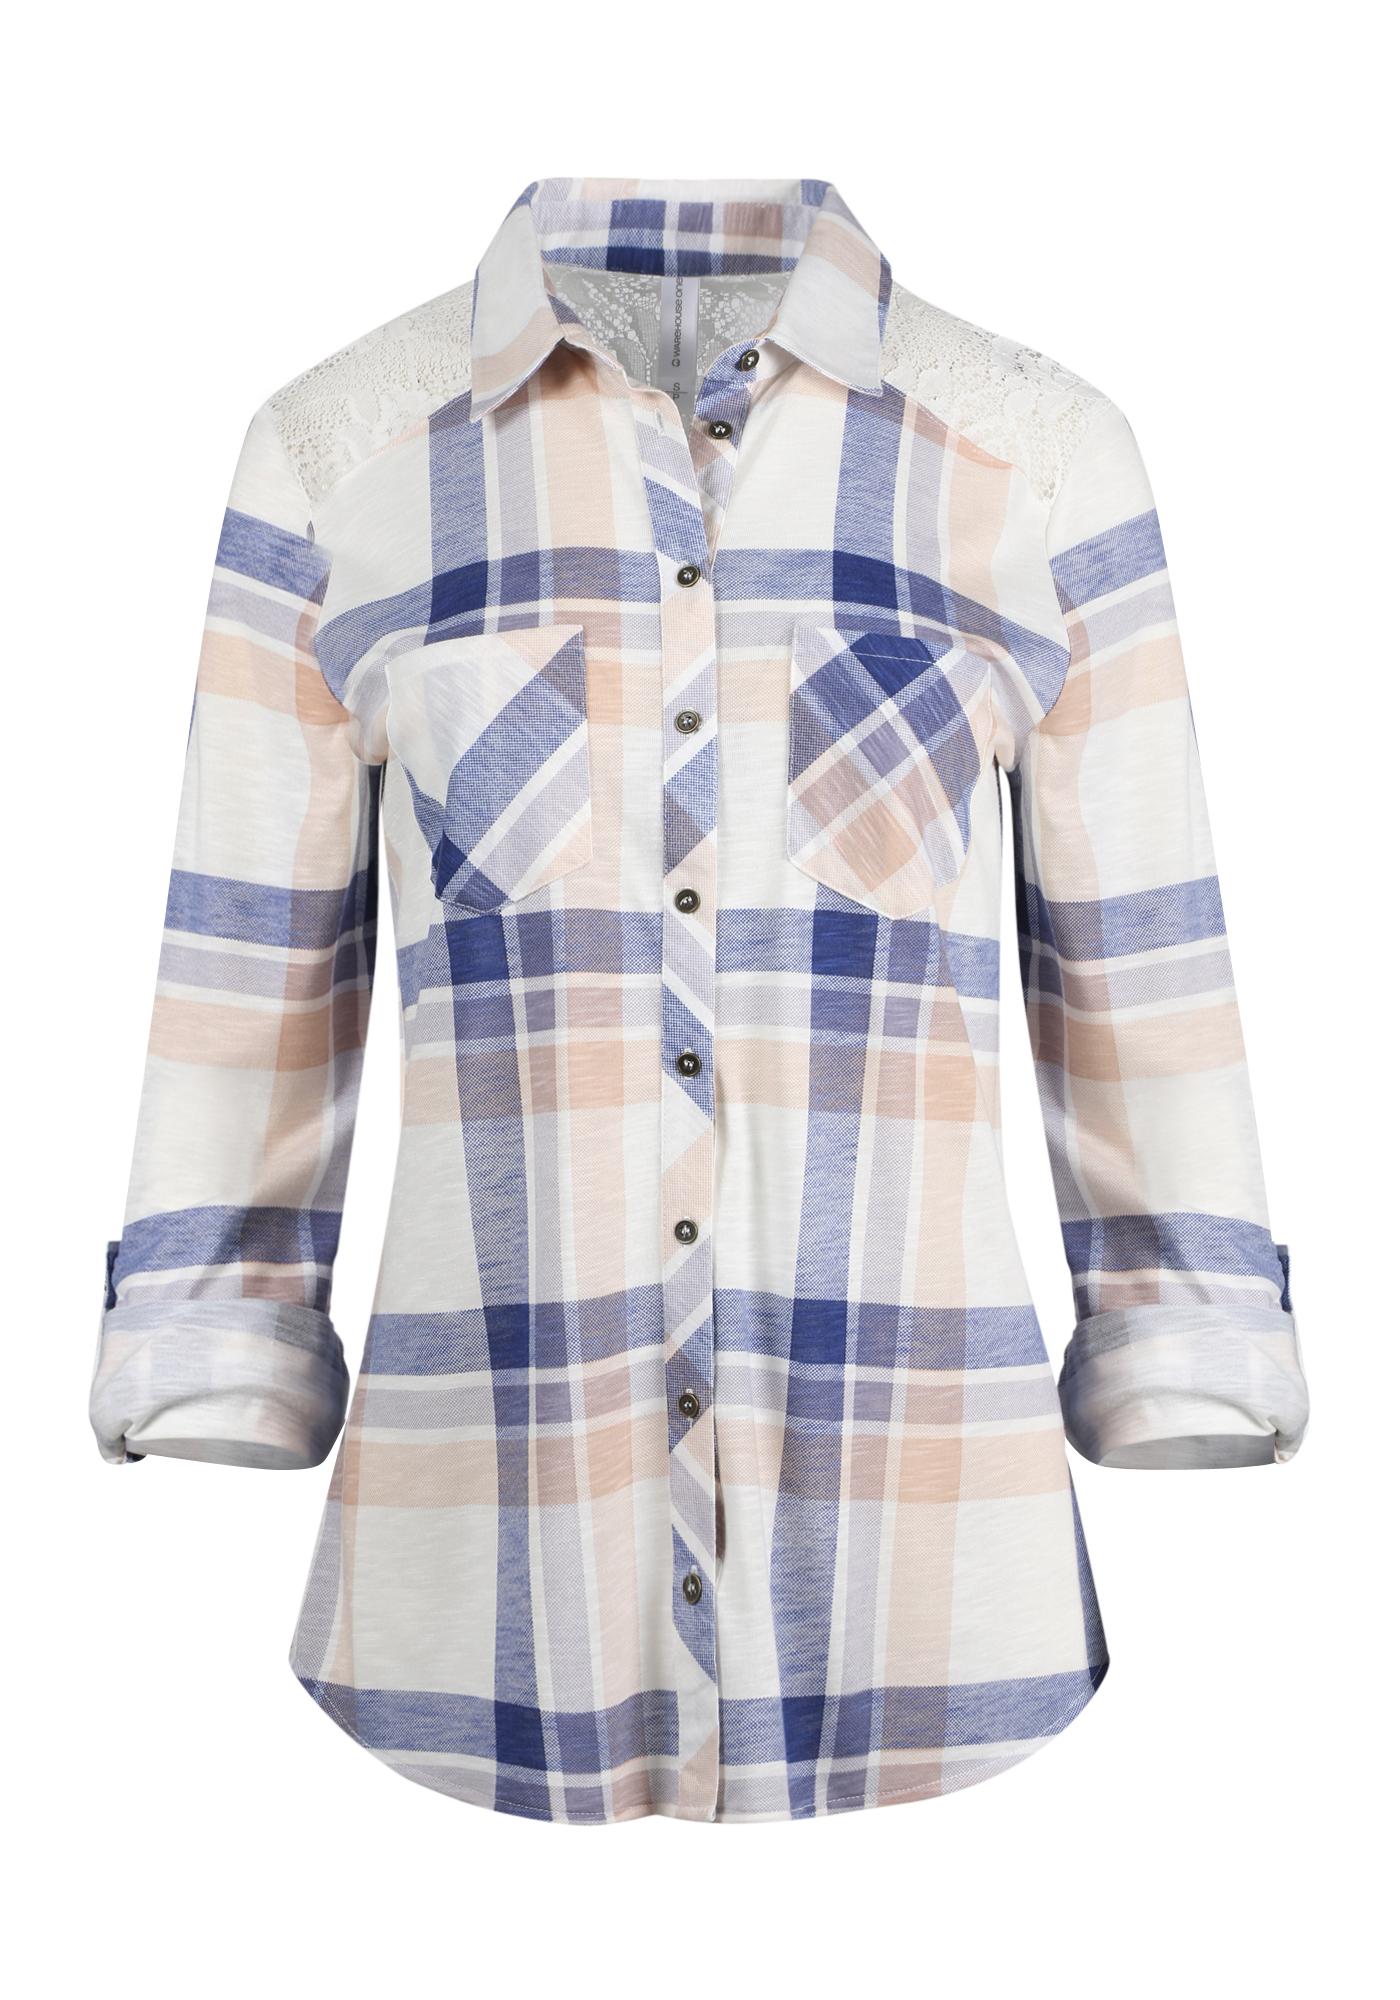 3b11ee0b Women's Lace Trim Knit Plaid Shirt, IVORY/LAVENDER, hi-res